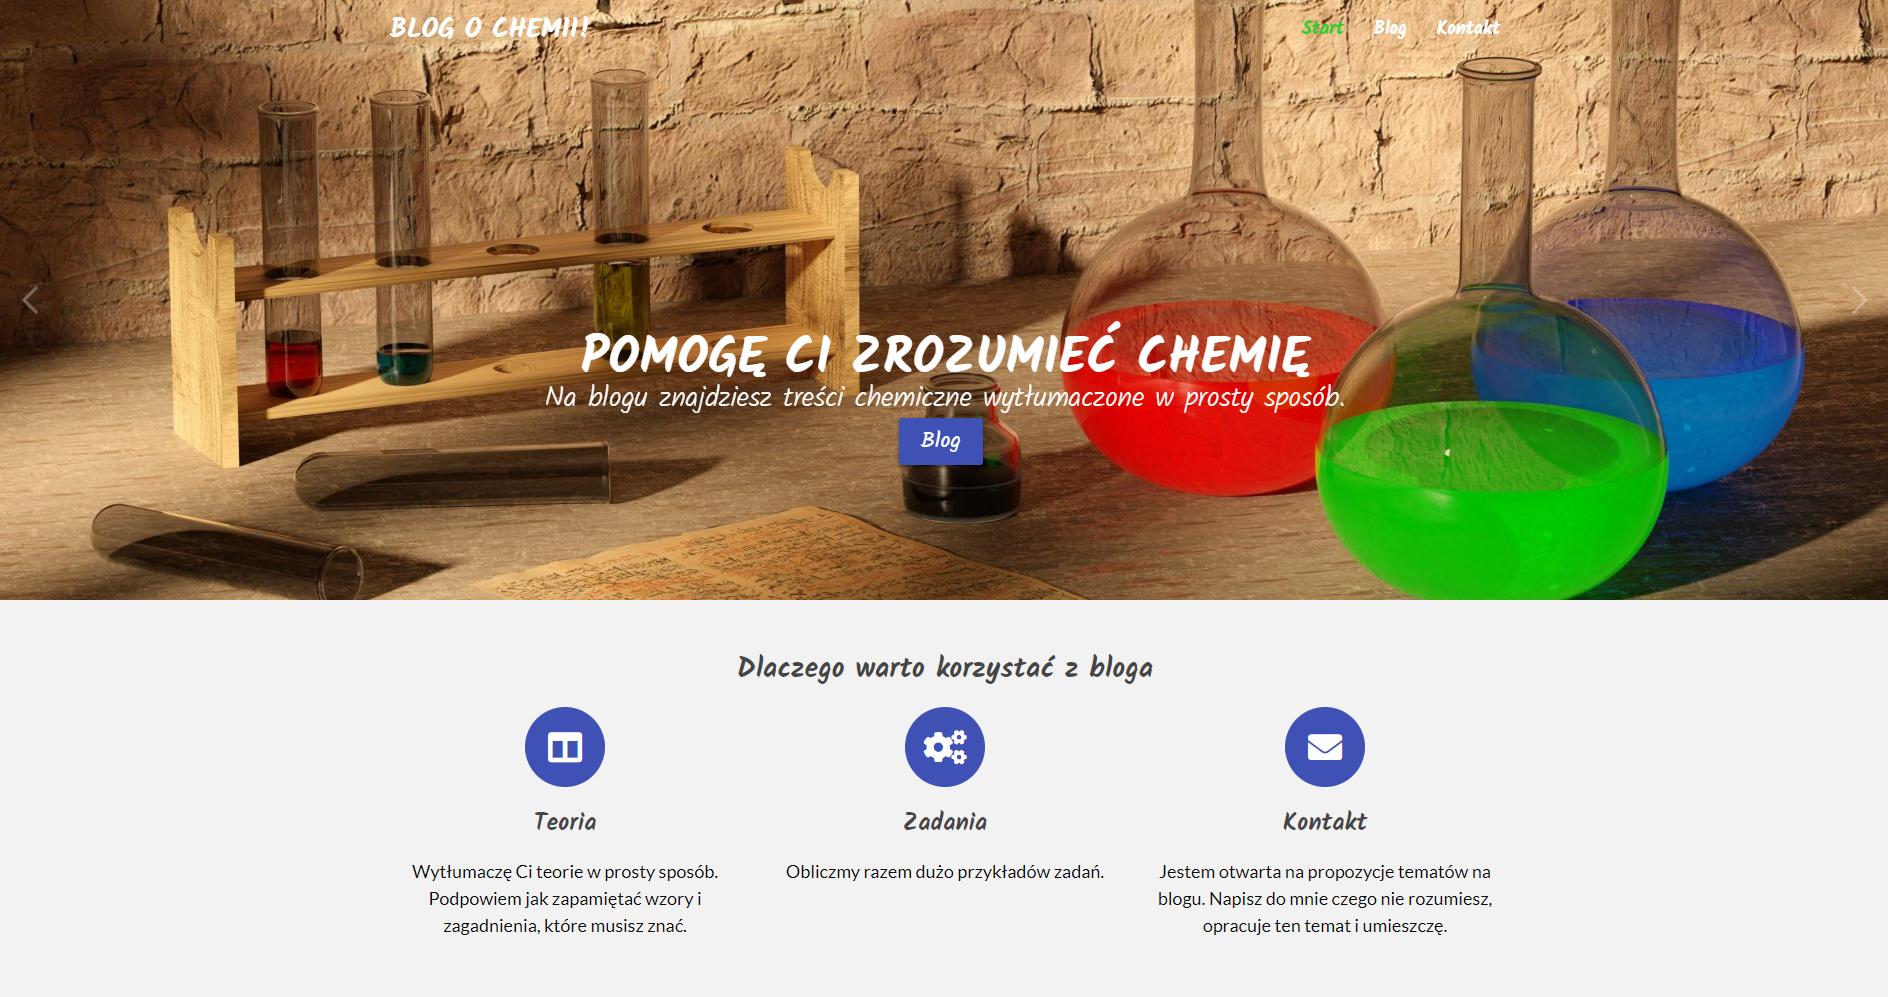 blog o chemii